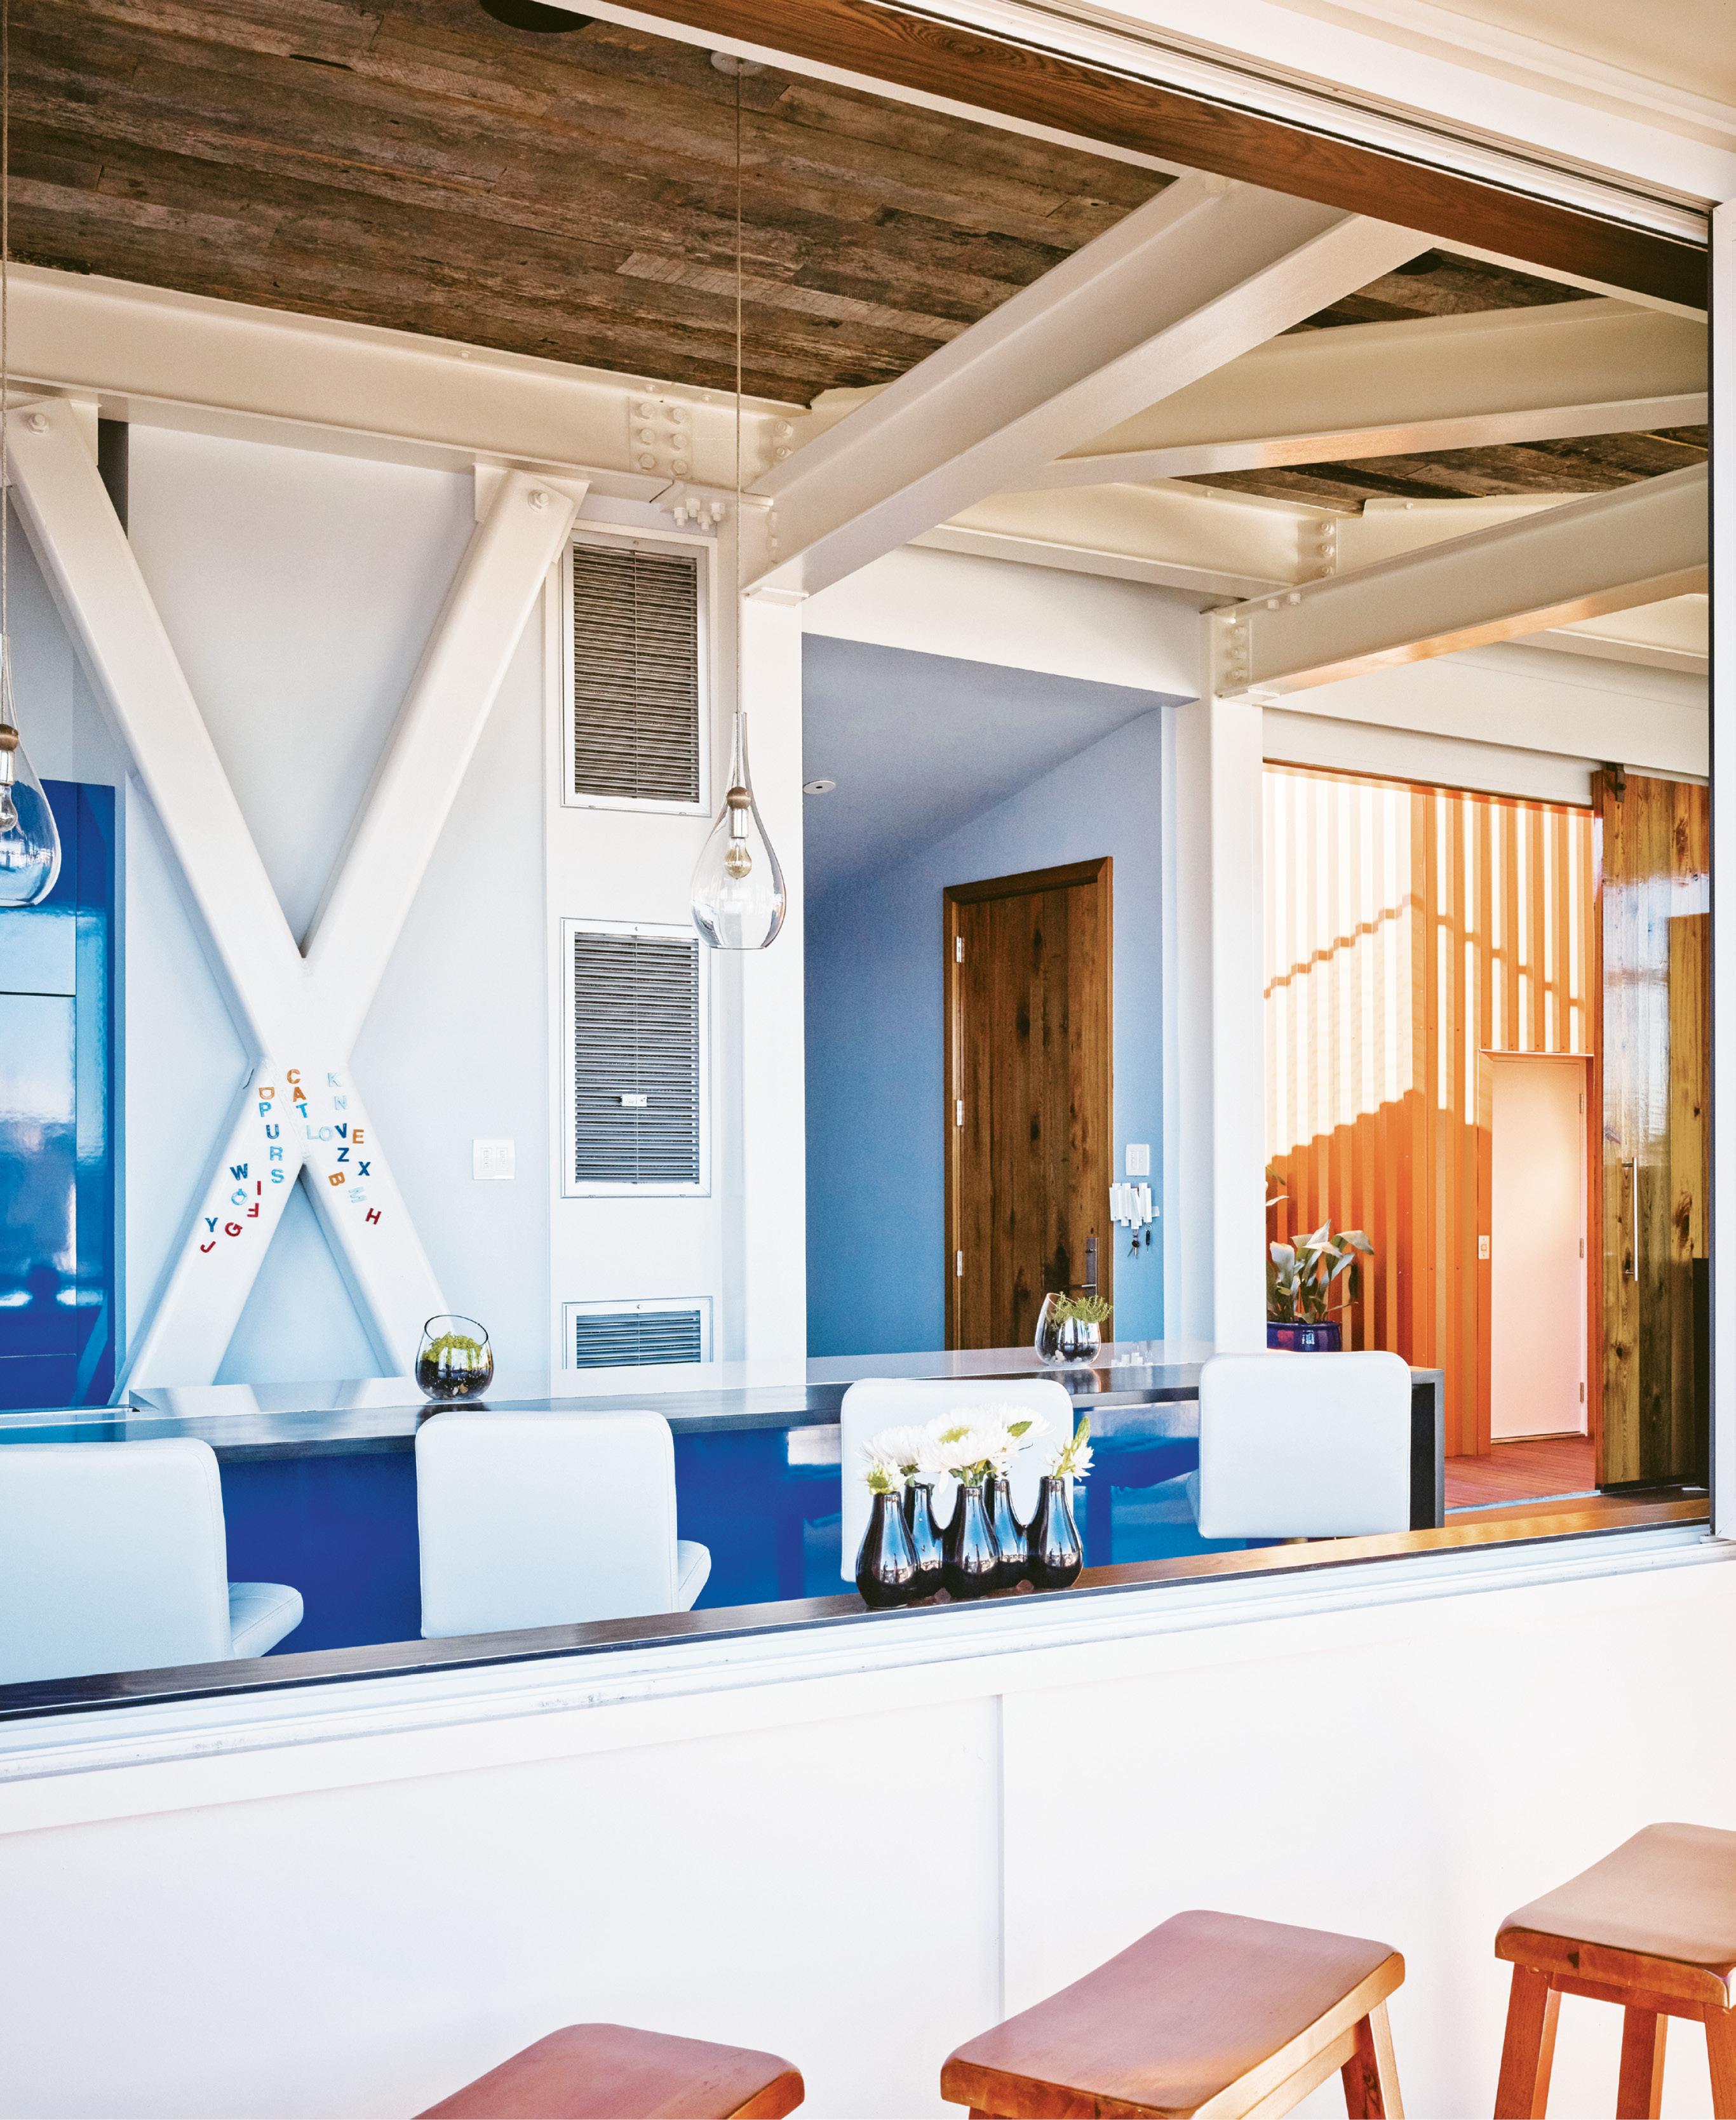 Custom acrylic cabinets in cobalt blue reflect Yessian's modern tastes.